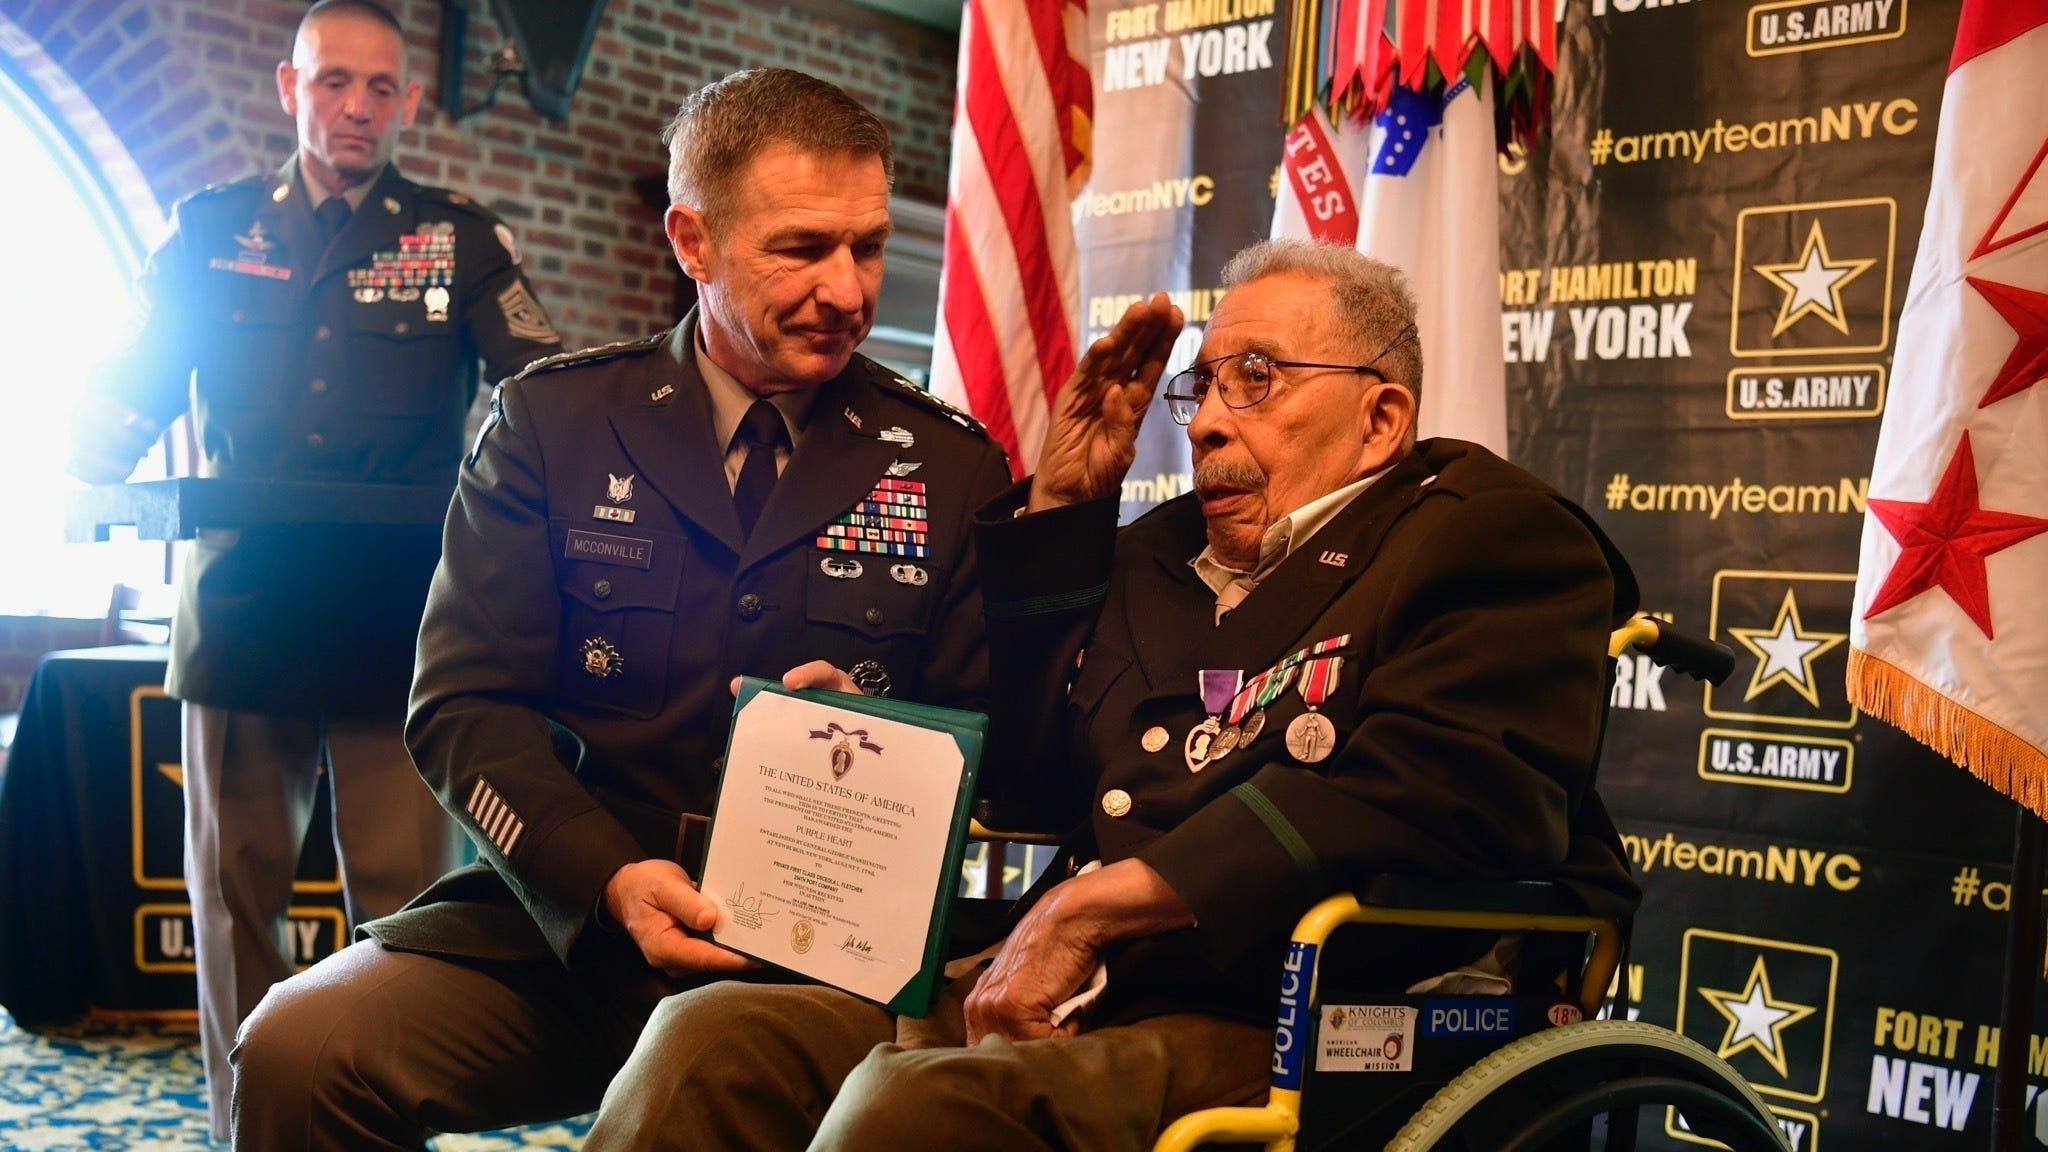 U.S. Army awards purple heart to 99-year-old World War II vet